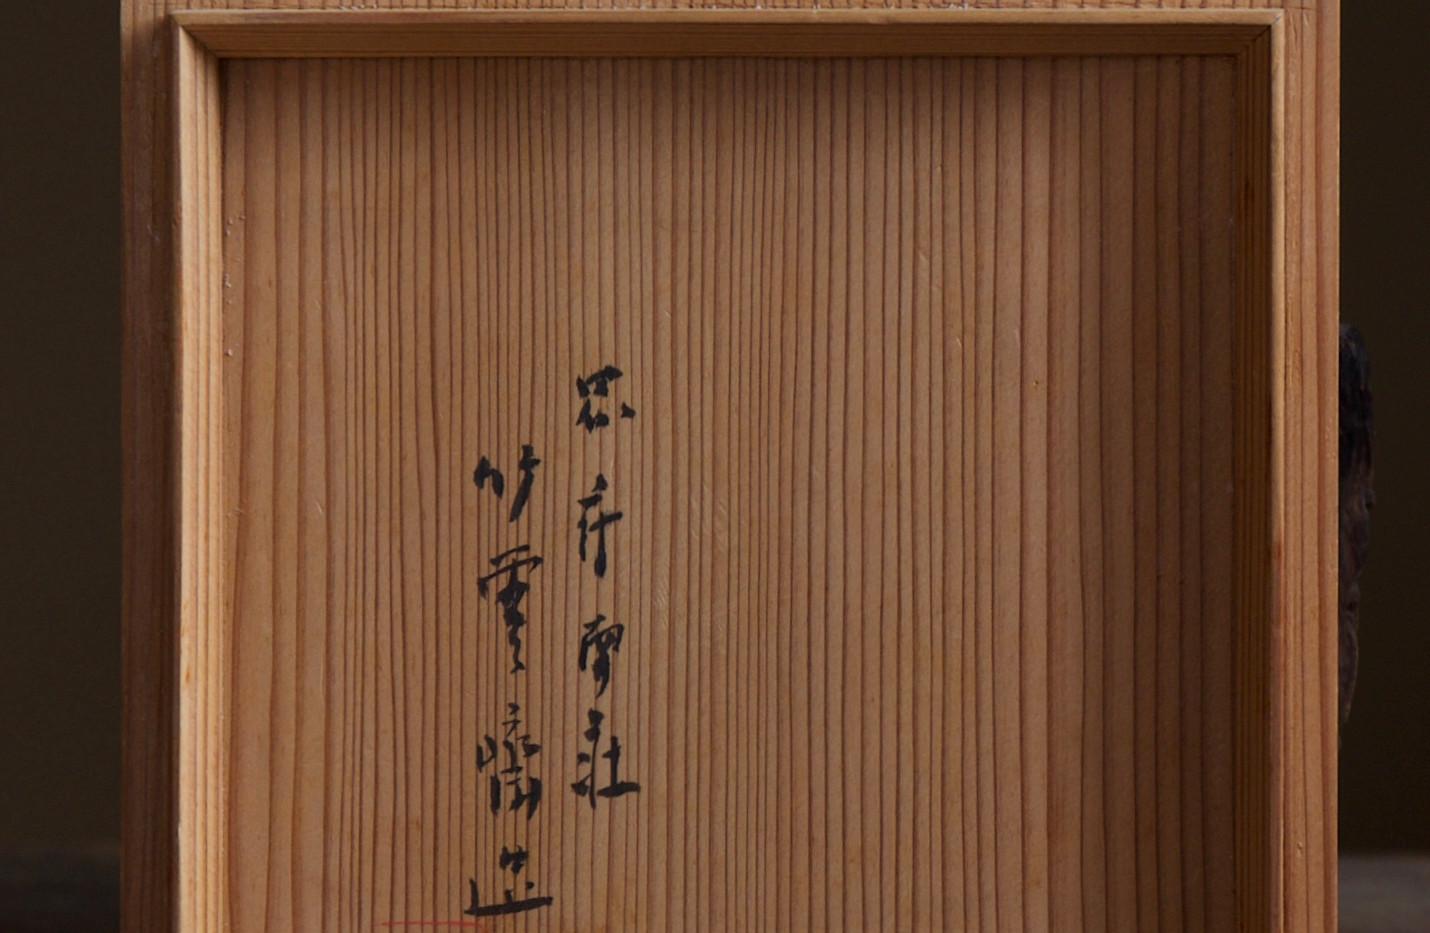 Tanabe Chikuunsai II Bamboo Fence 06.jpg